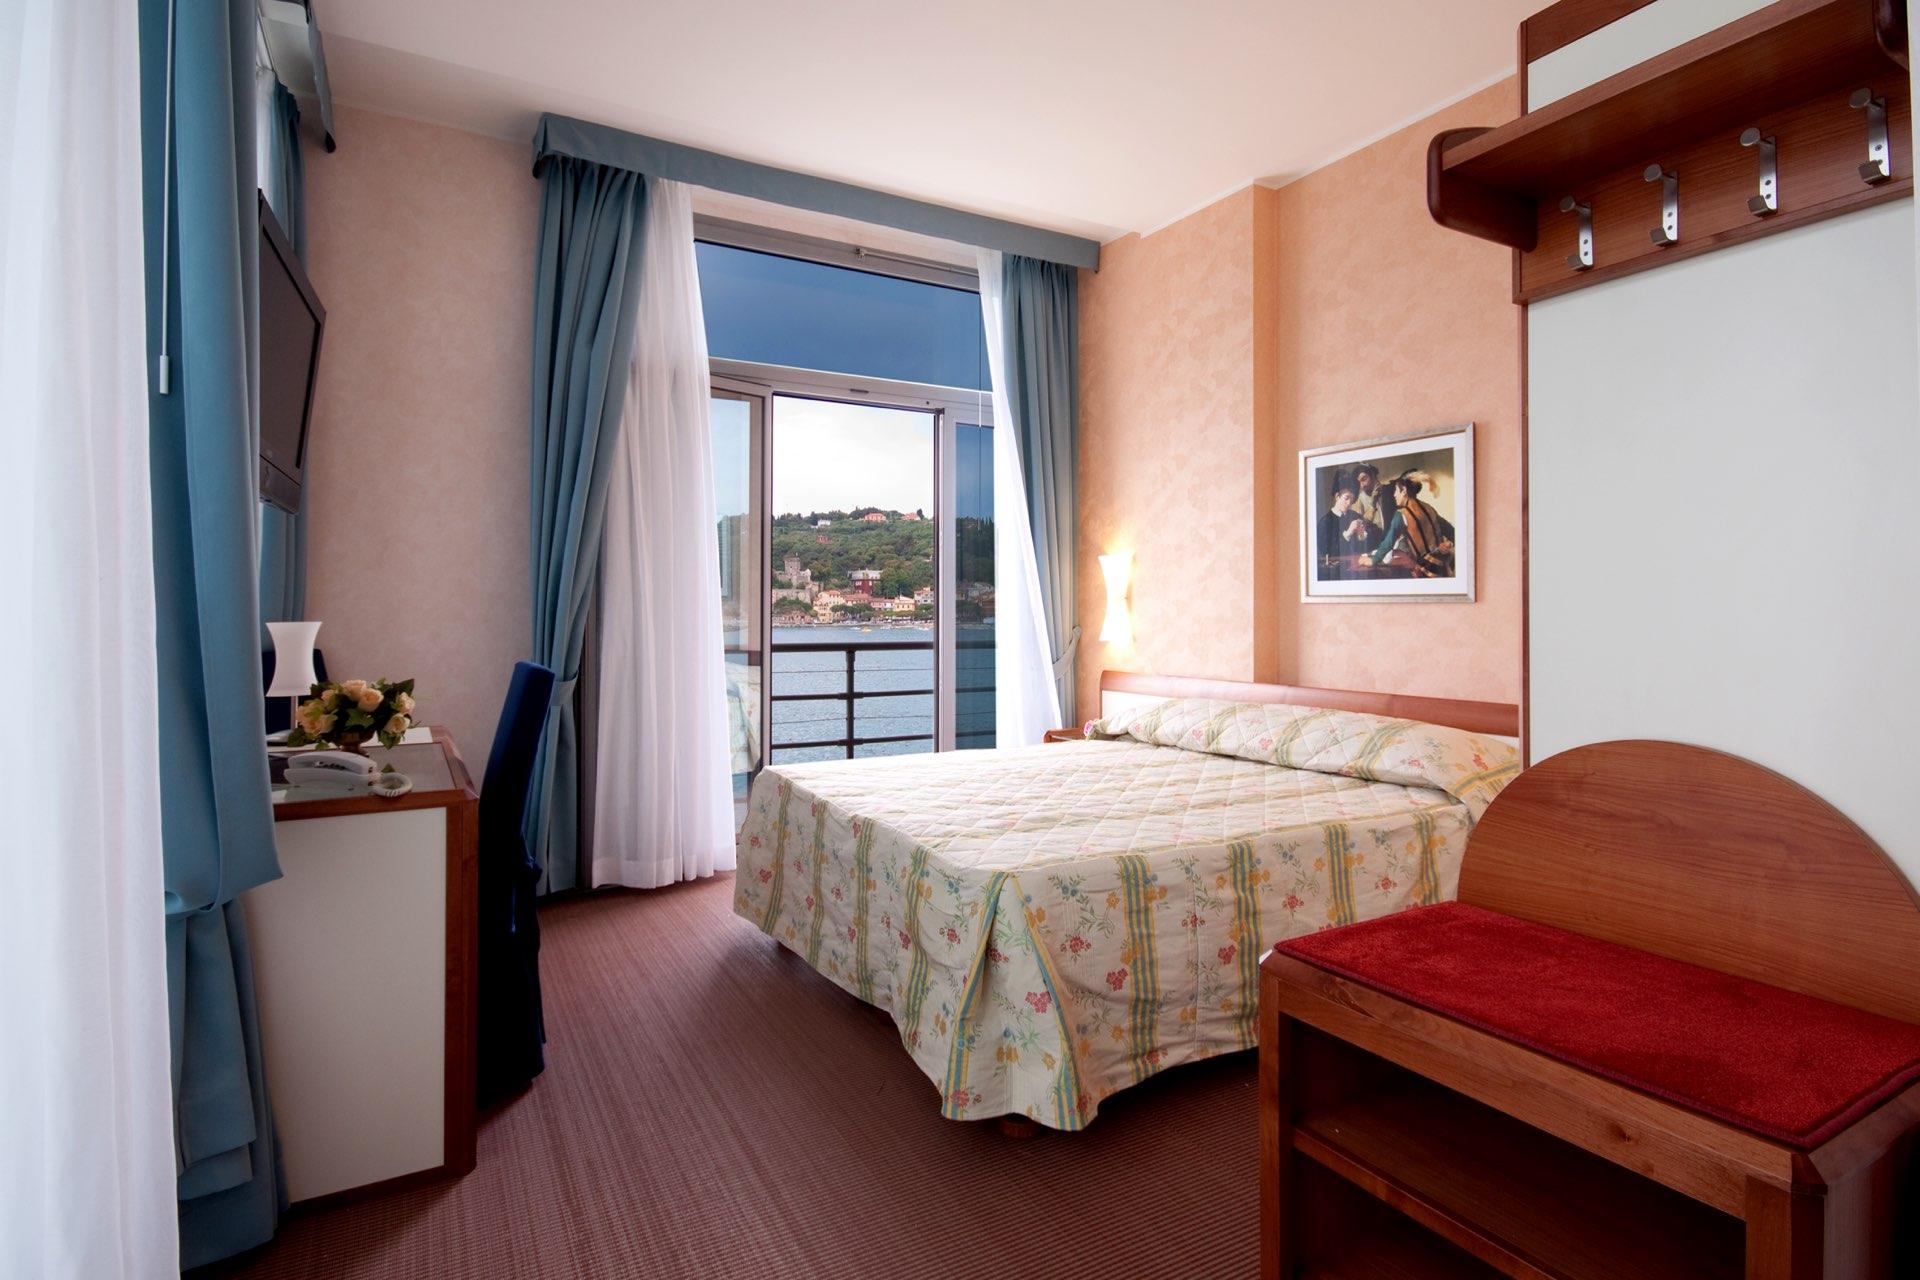 hotel-san-terenzo-camera-vista-6535